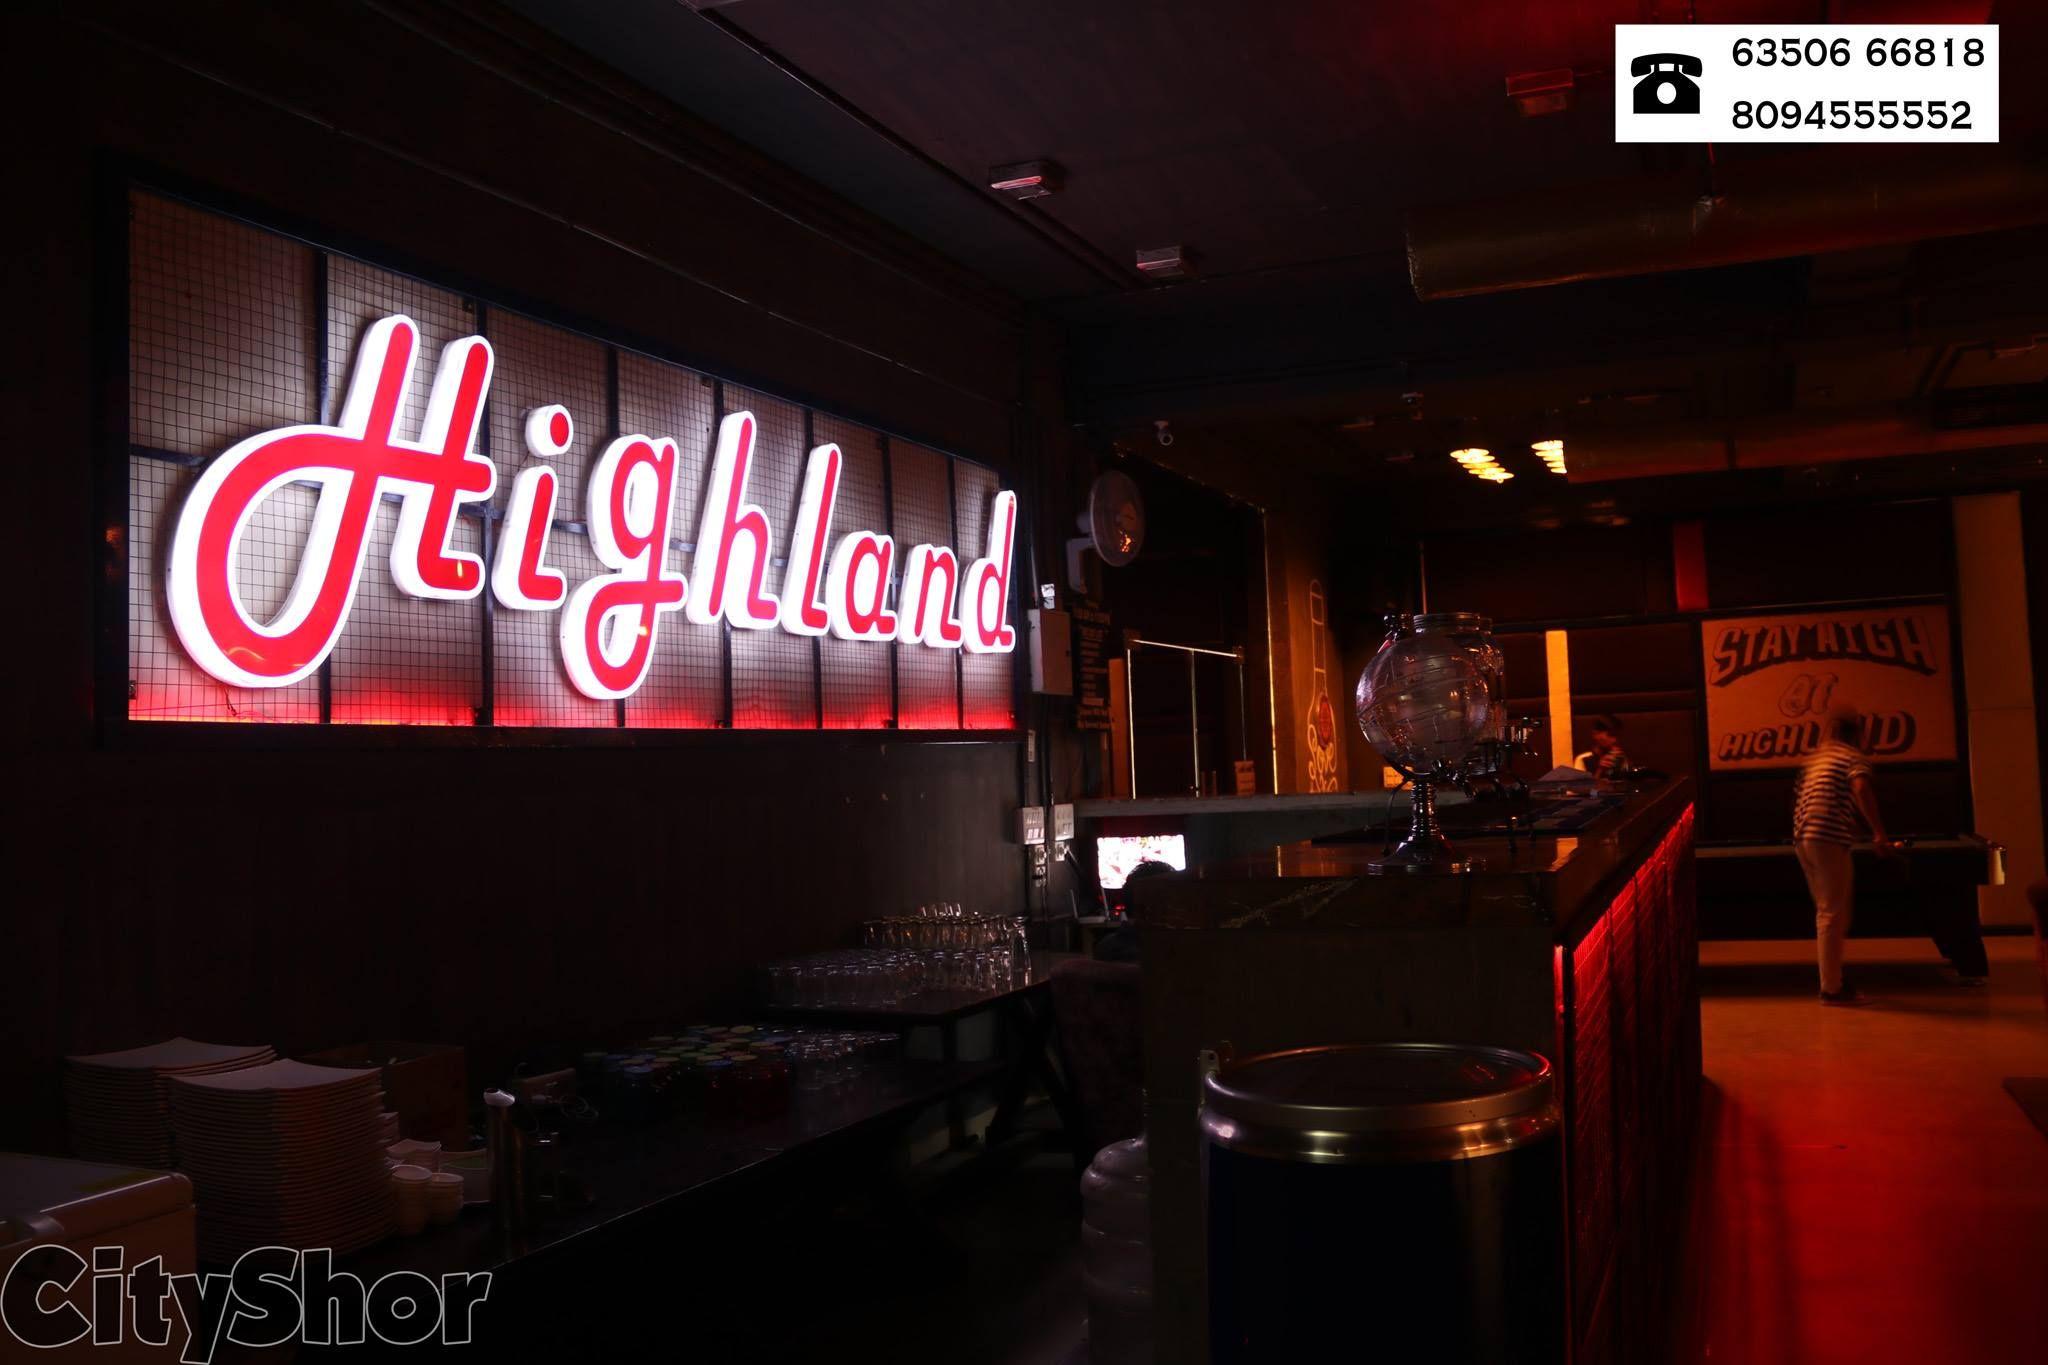 A Romantic Setup For This Valentine S Day Than Look No Further Than Highland Address Gf 01 Galaxy Mall Mansarov Cafe Restaurant Romantic Evening Restaurant